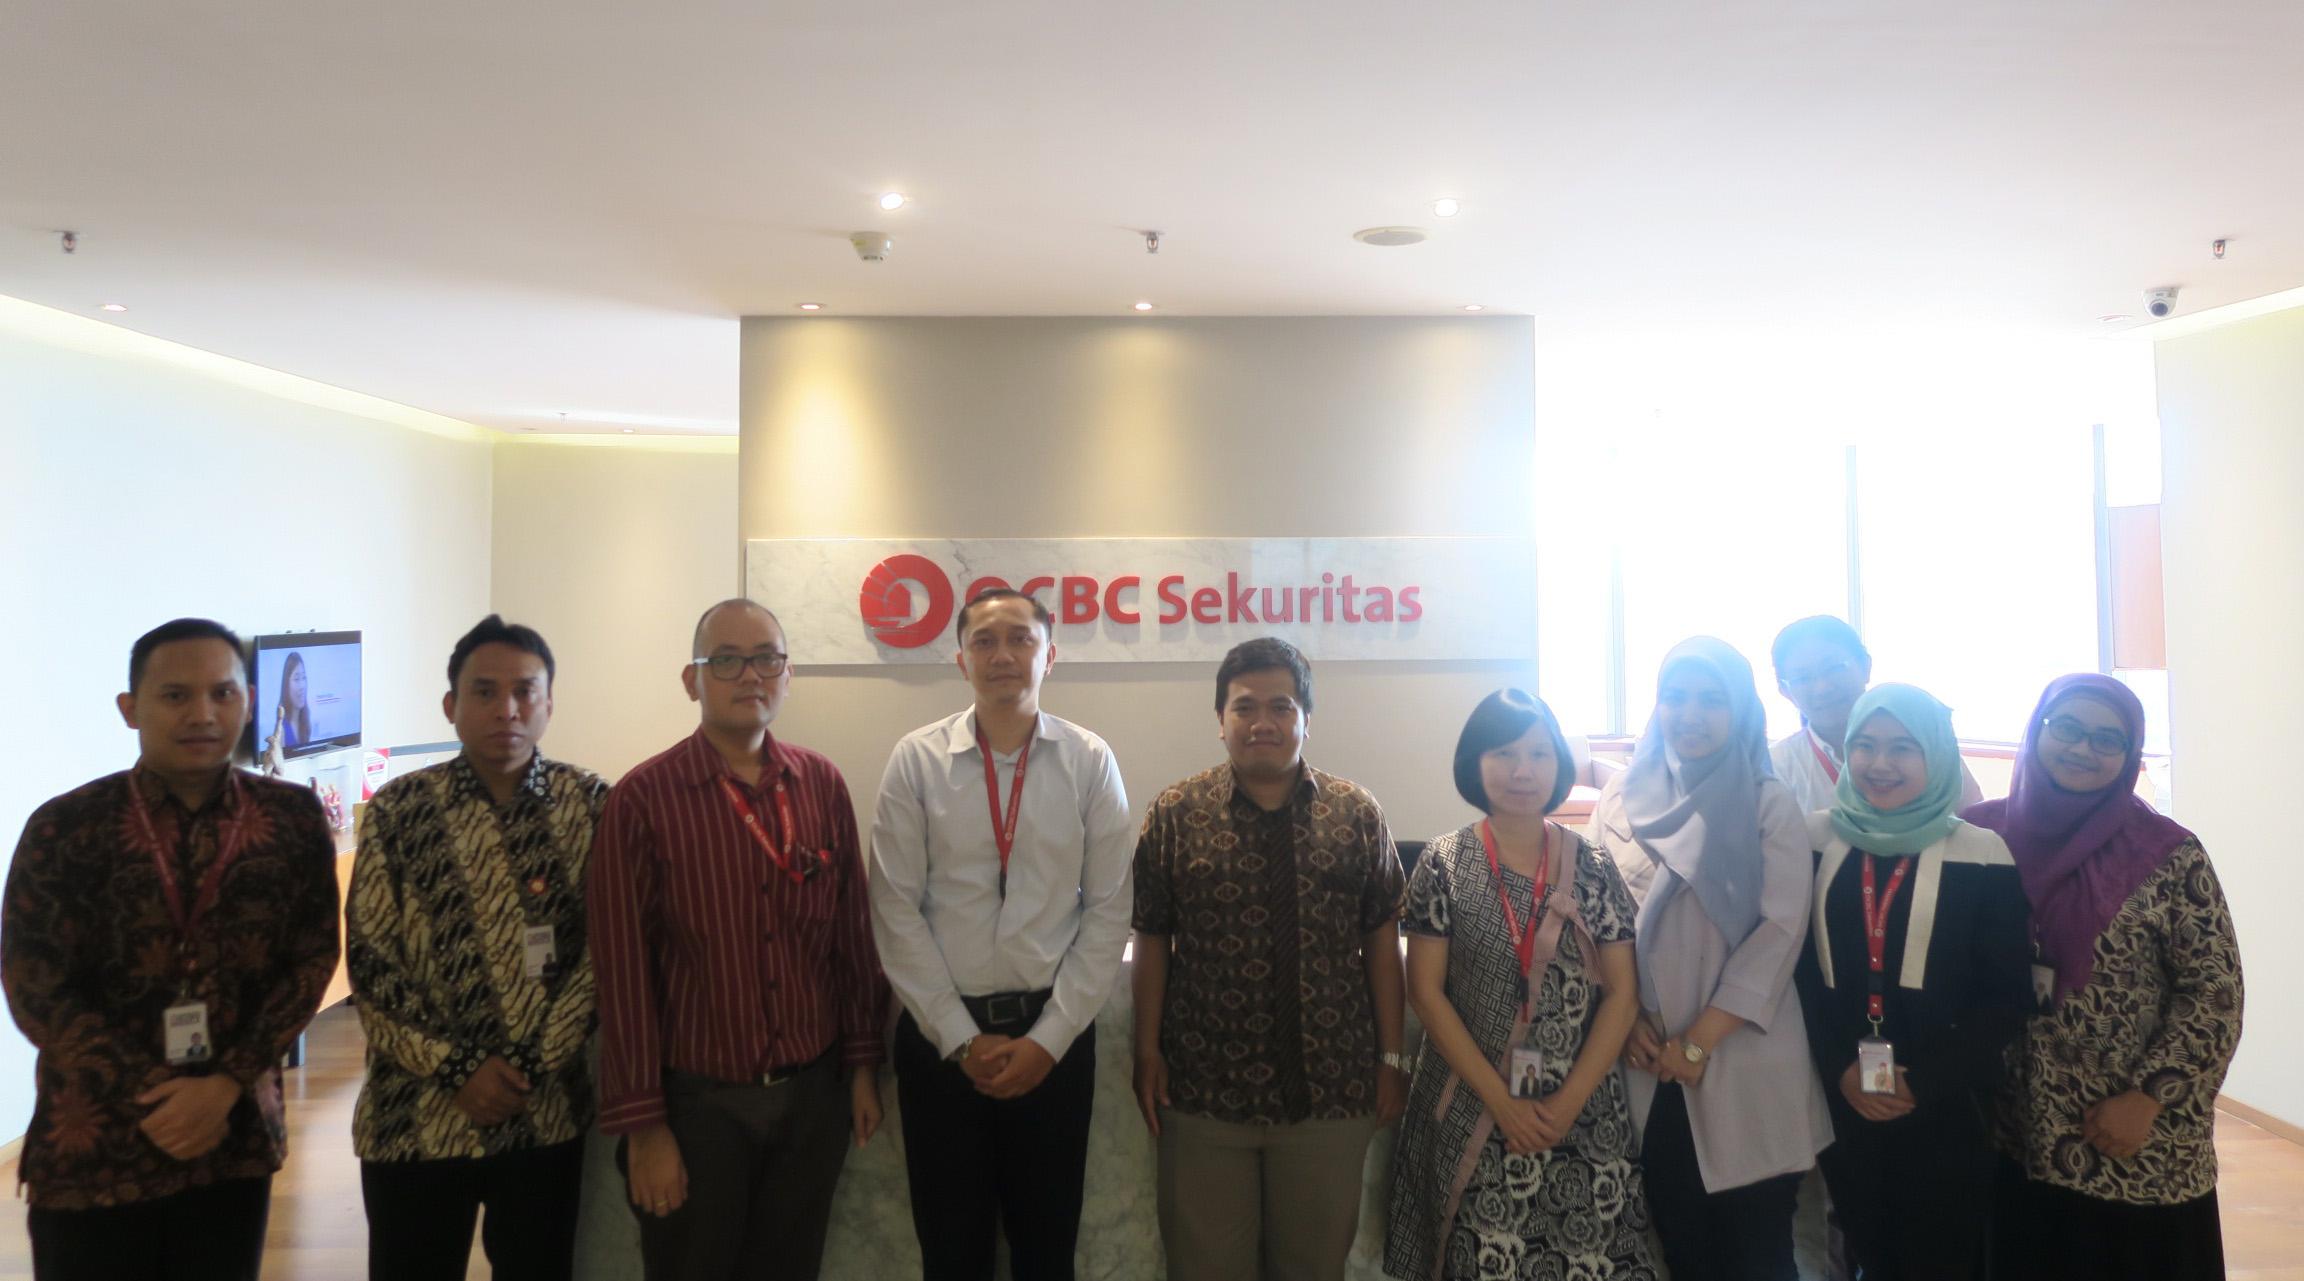 Kunjungan ke OCBC Sekuritas dalam Rangka Sosialisasi Dana Perlindungan Pemodal